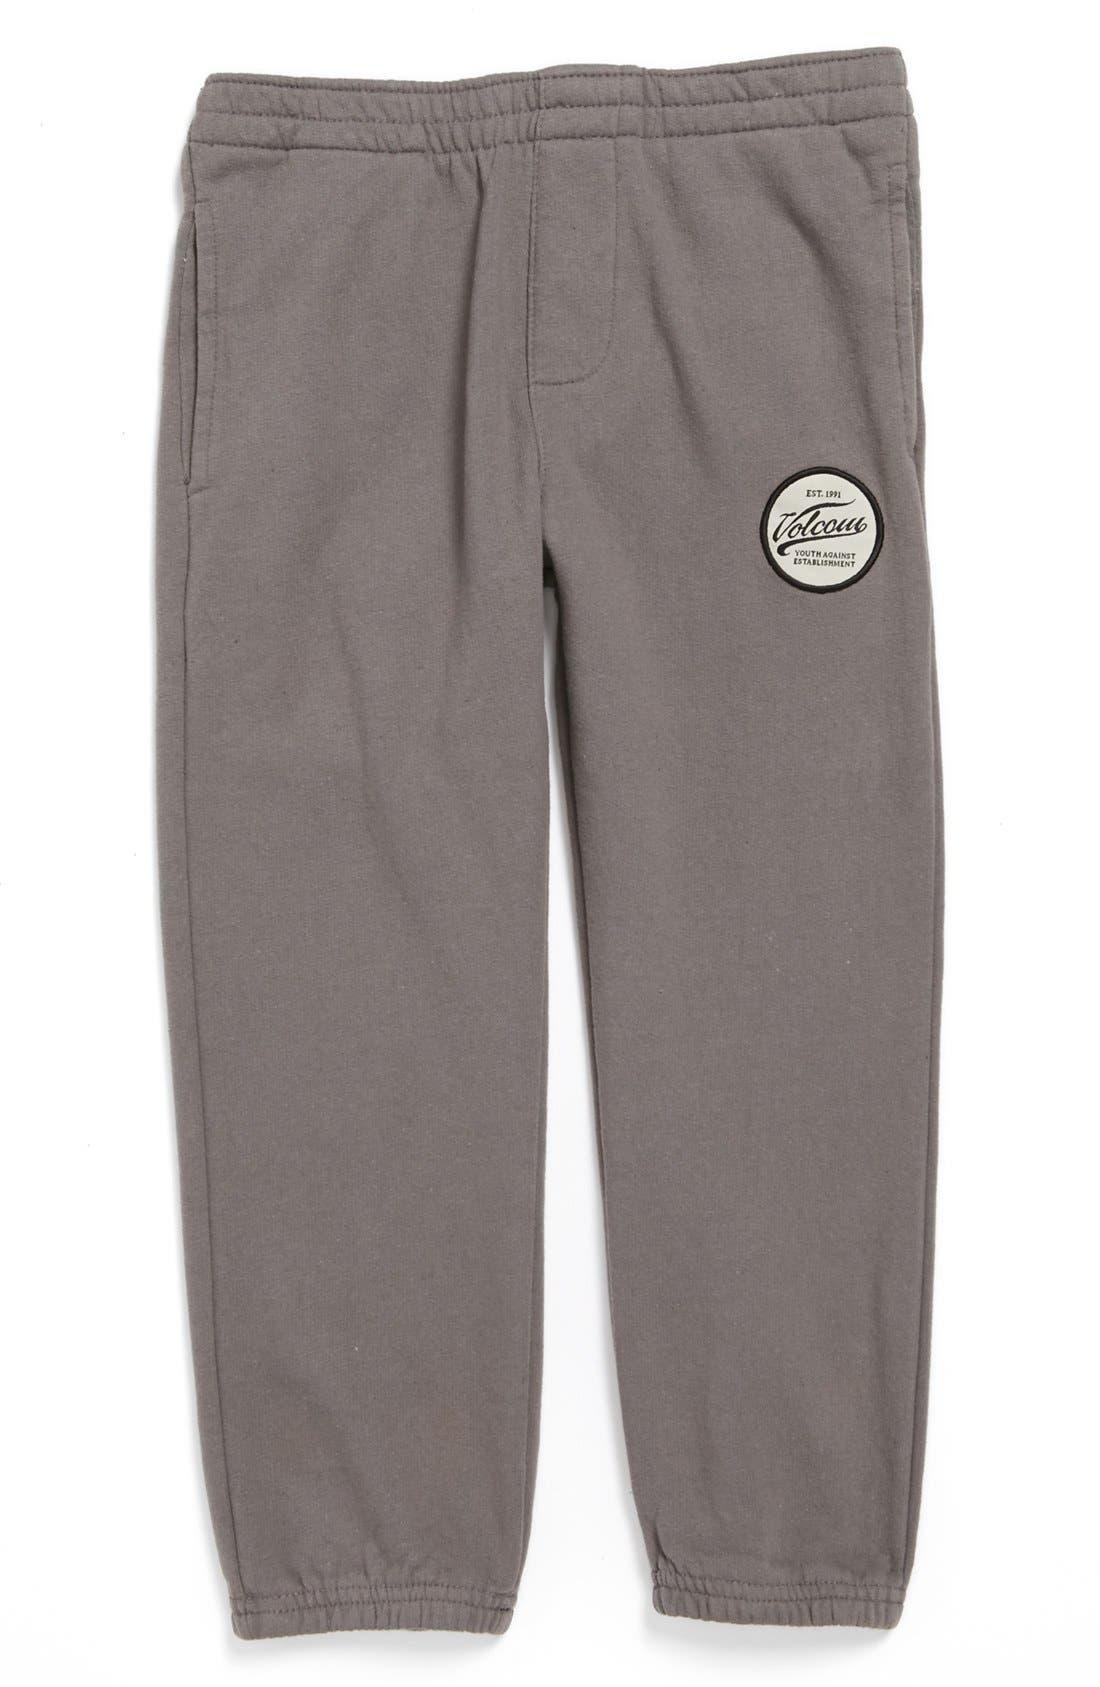 Alternate Image 1 Selected - Volcom 'Programer' Fleece Lined Sweatpants (Little Boys)